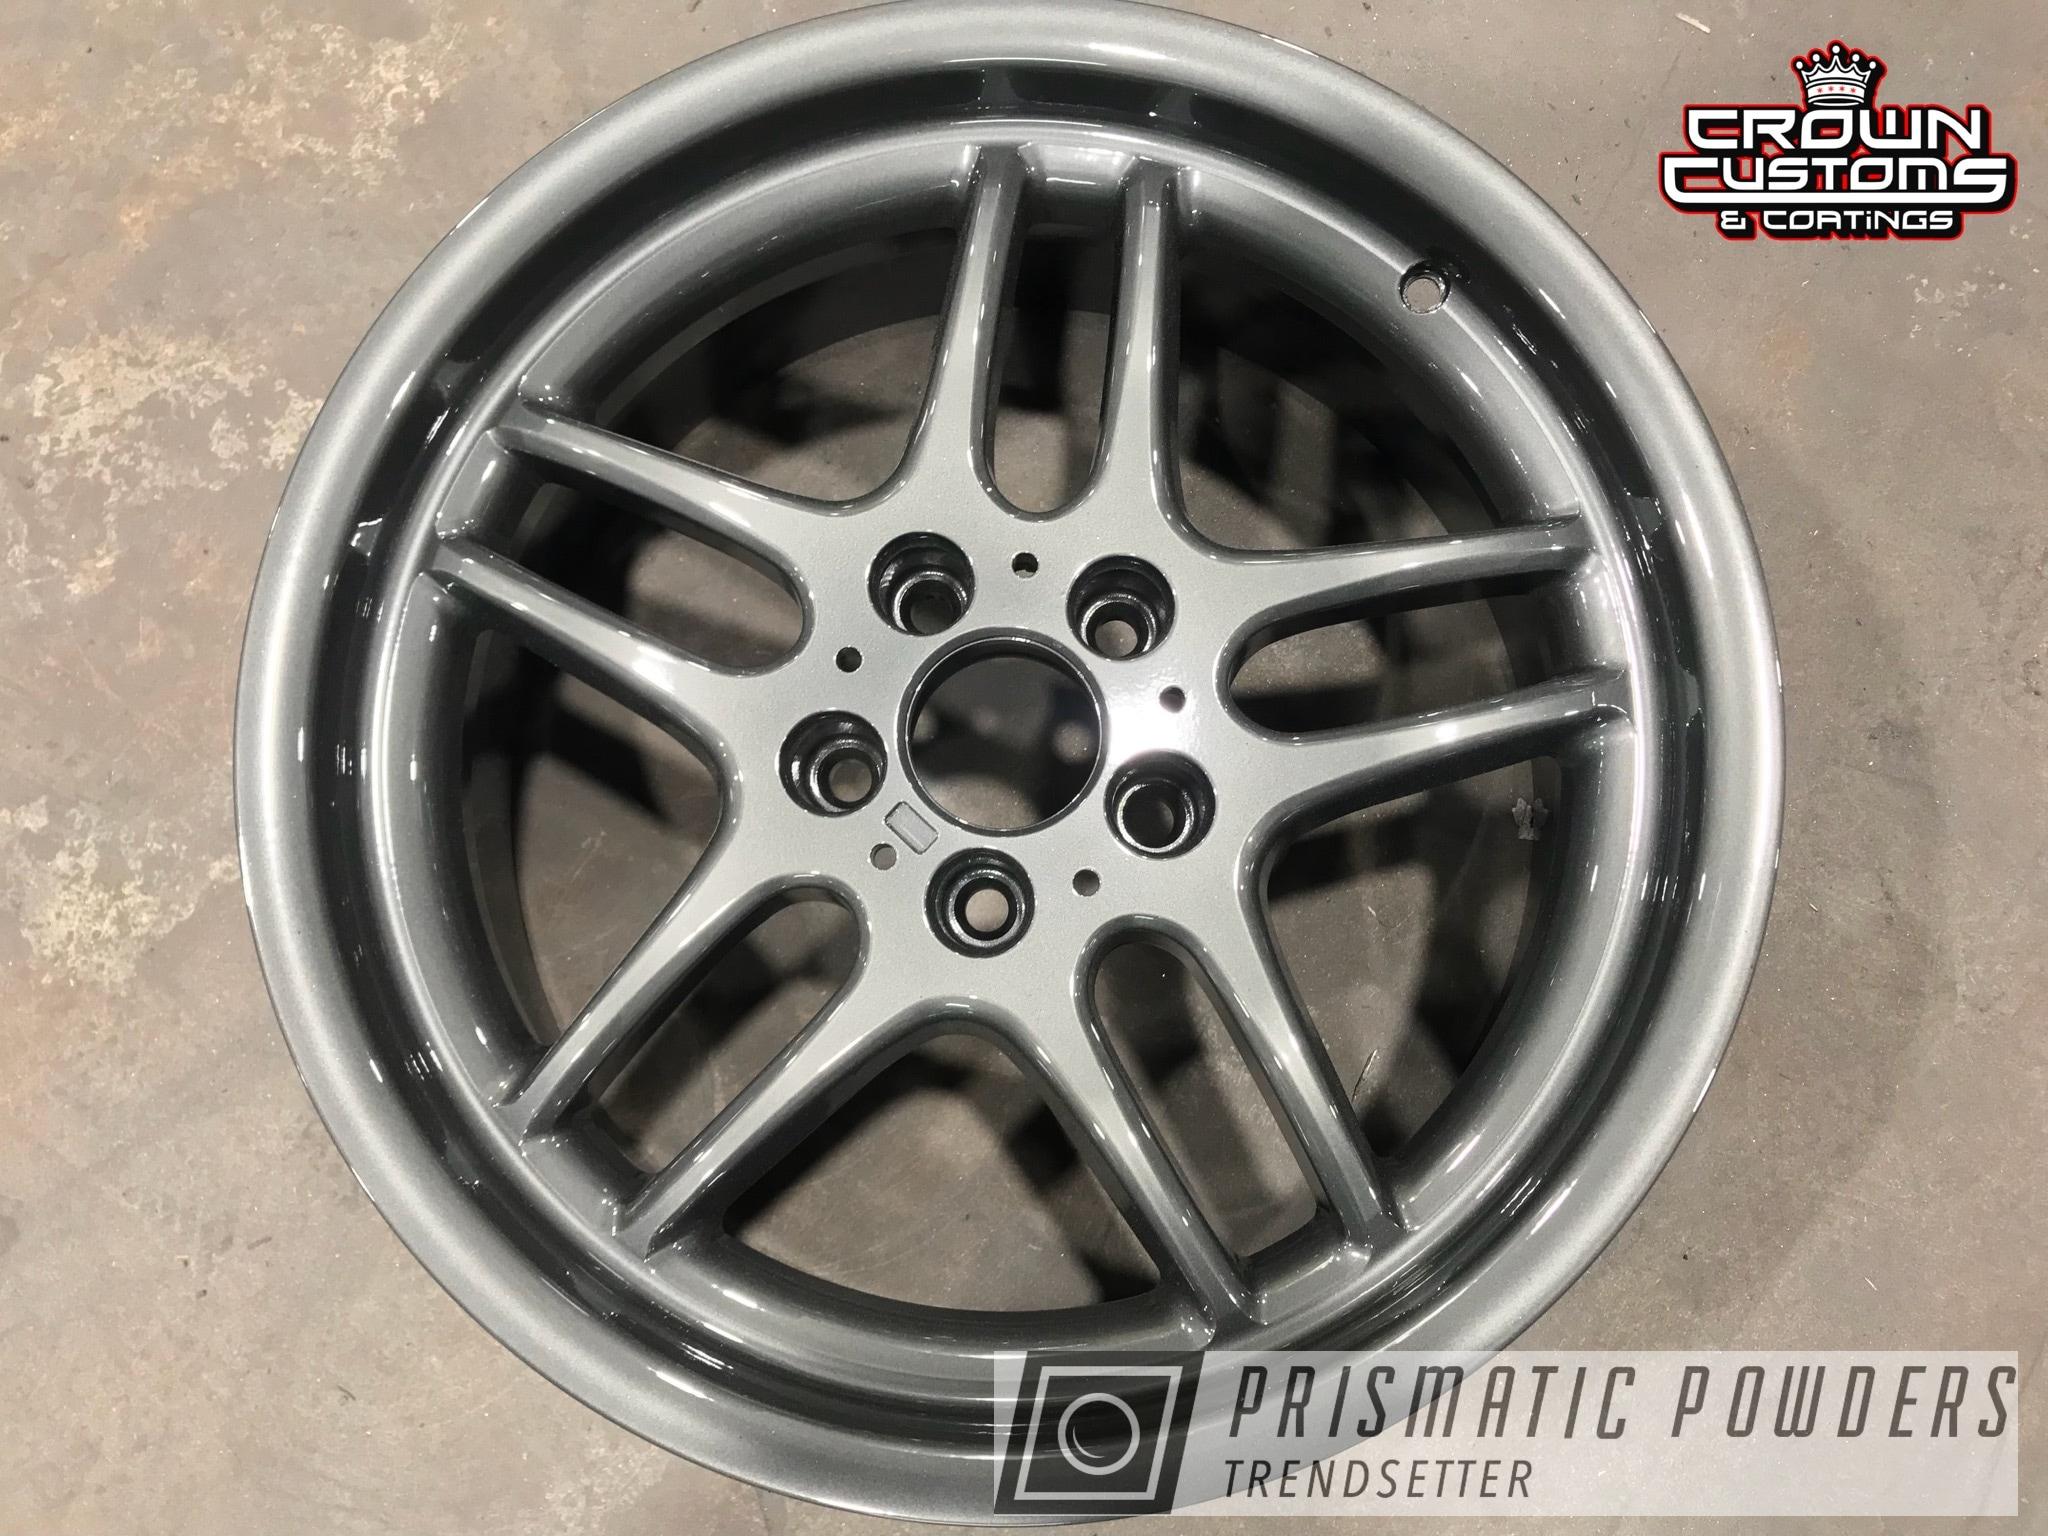 Powder Coating: Wheels,Automotive,Evo Grey PMB-5969,Clear Vision PPS-2974,BMW Wheels,BMW,Clear Vision Top Coat,BMW M5 Wheels,Powder Coated M5 BMW Wheels